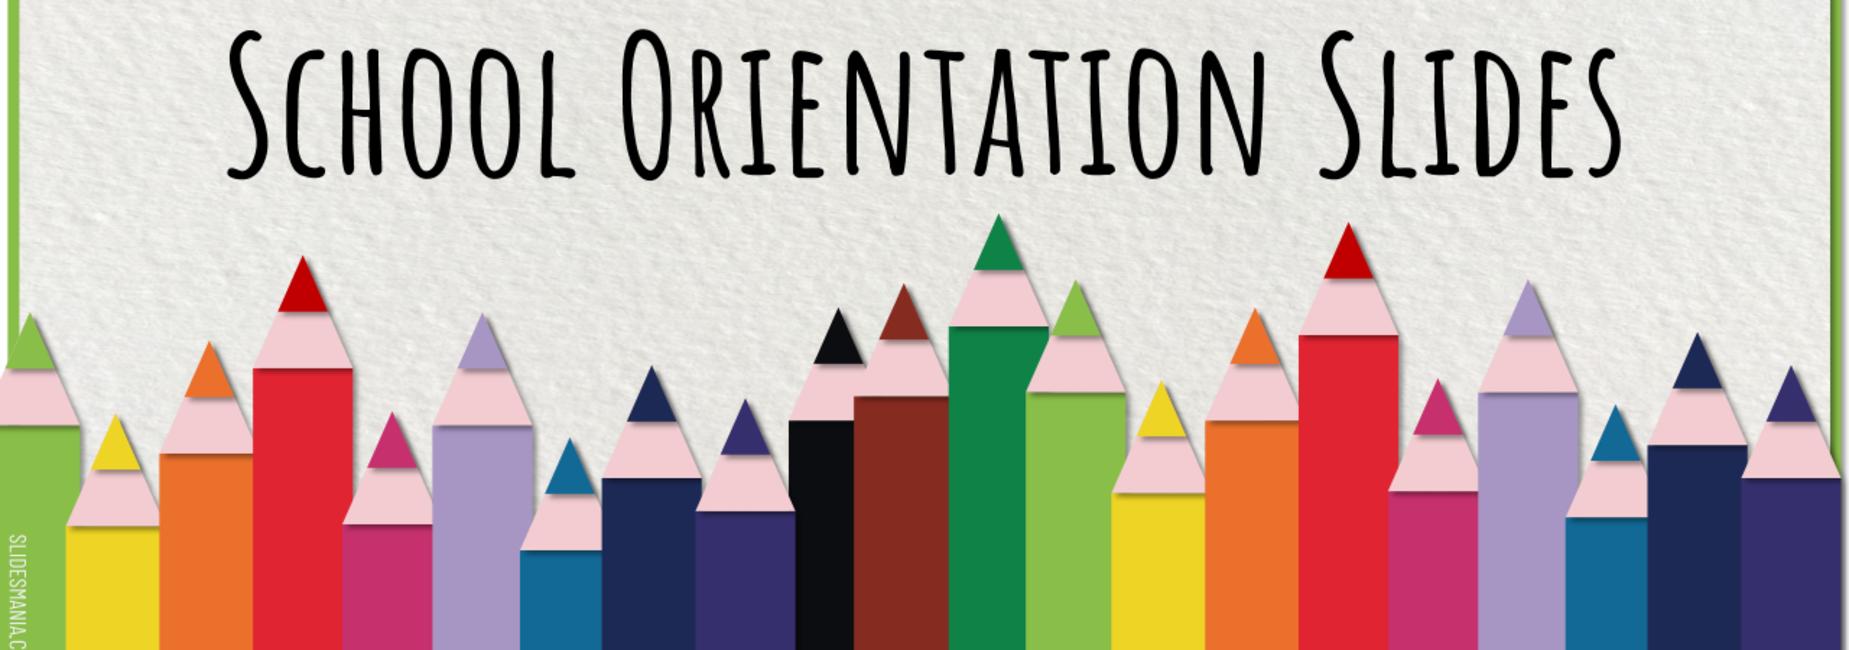 School Orientation Videos